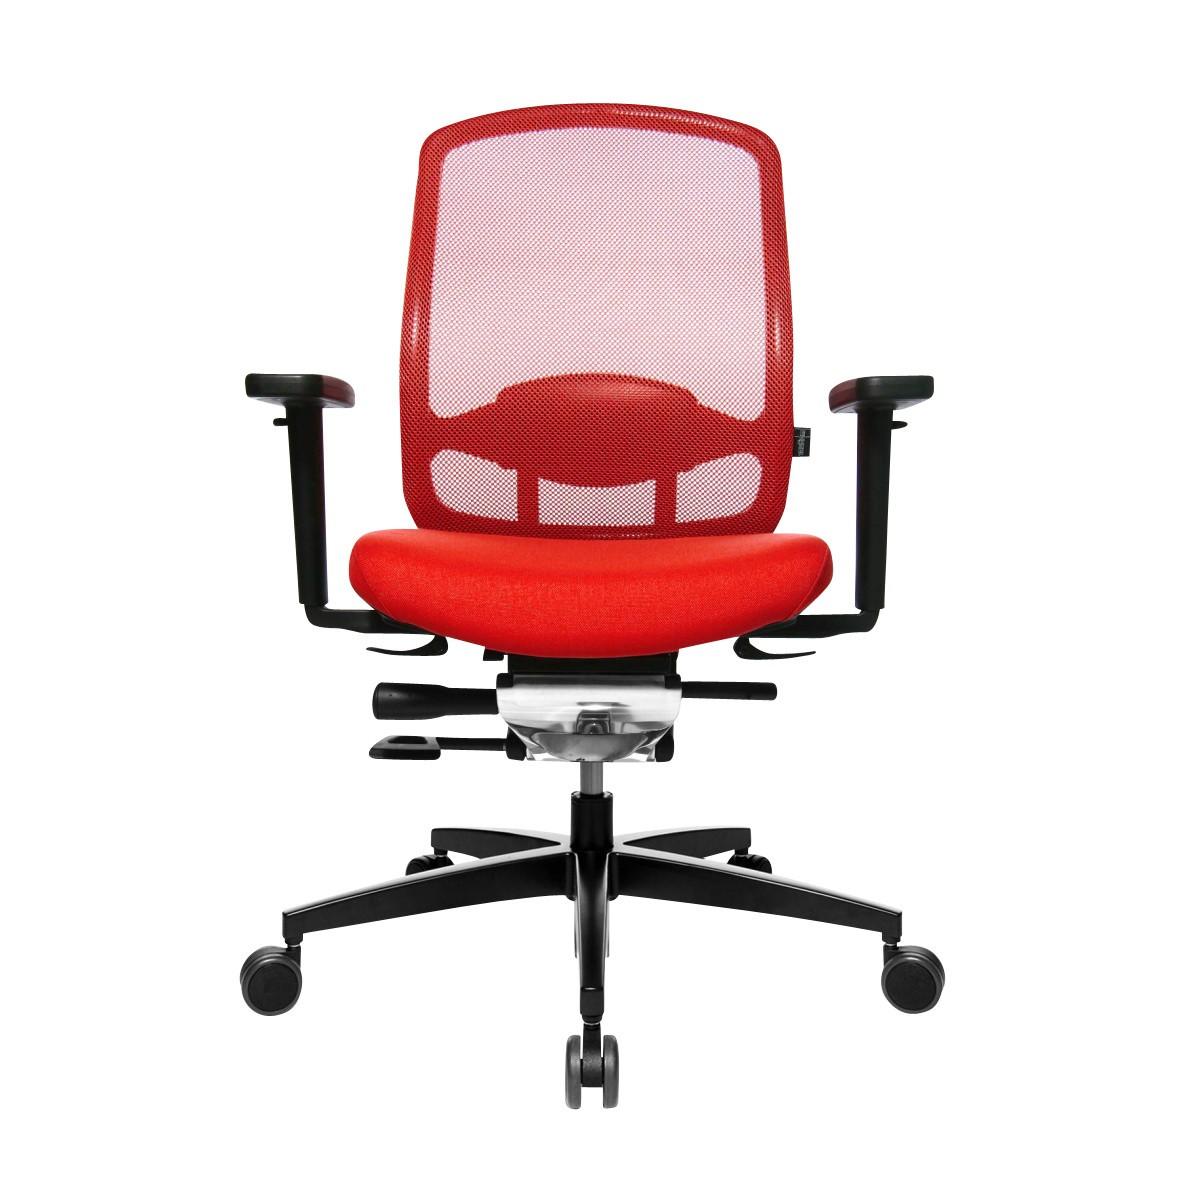 Chaise De 5 Alumedic Bureau qUMGSVLpjz